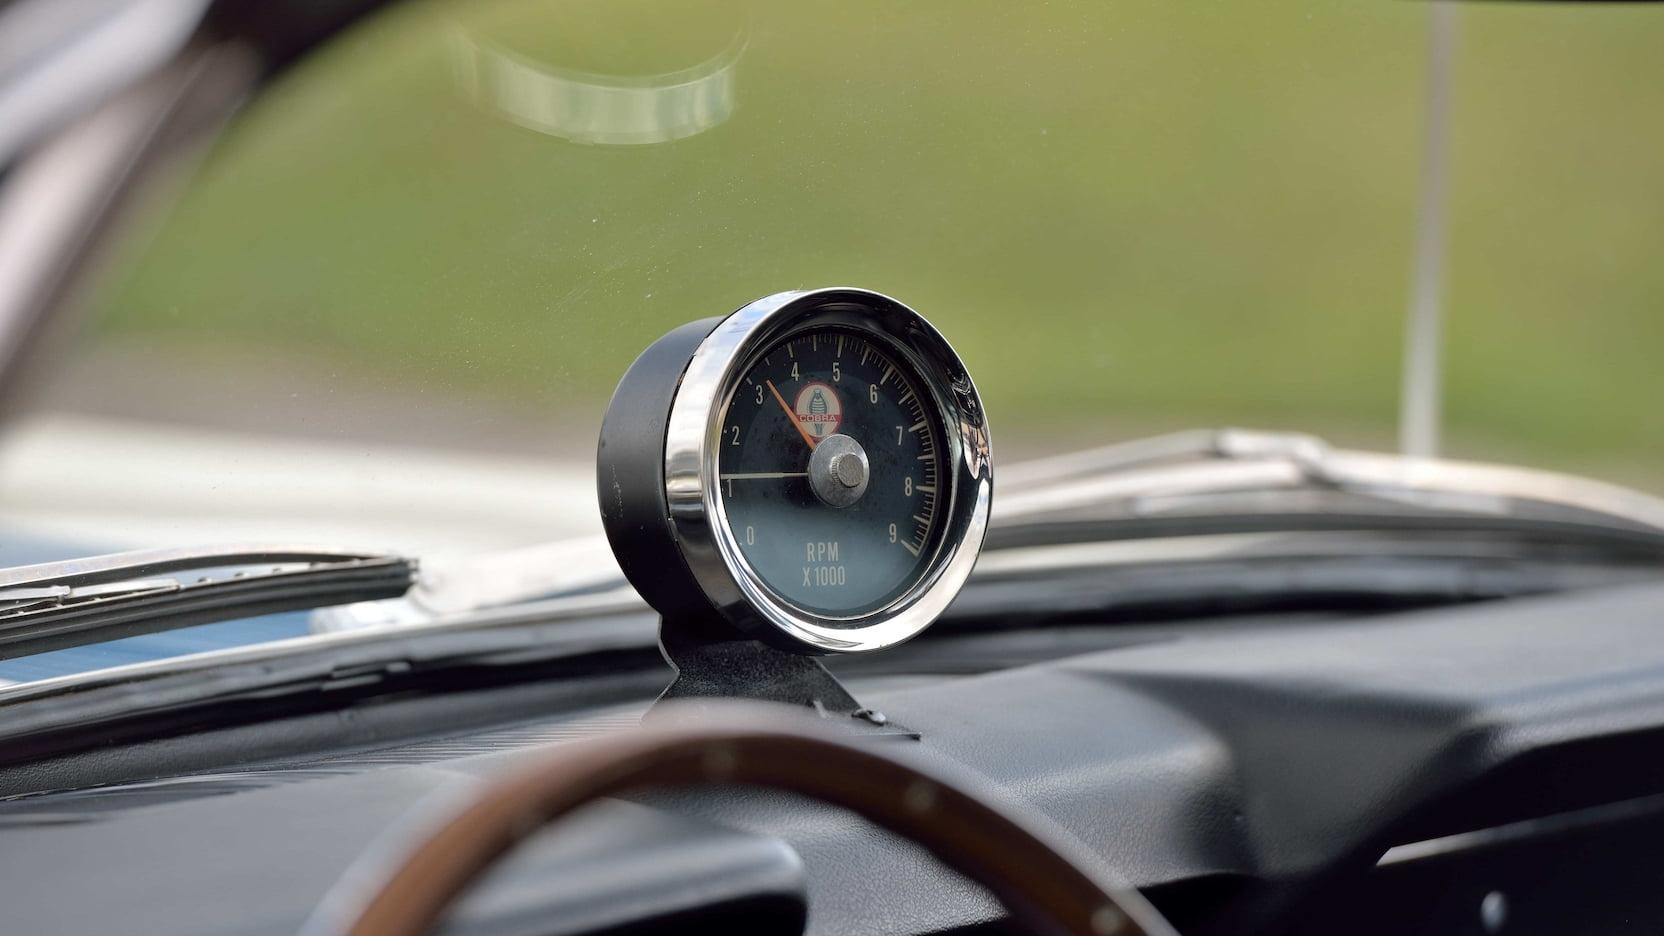 1966 Shelby GT350 tach